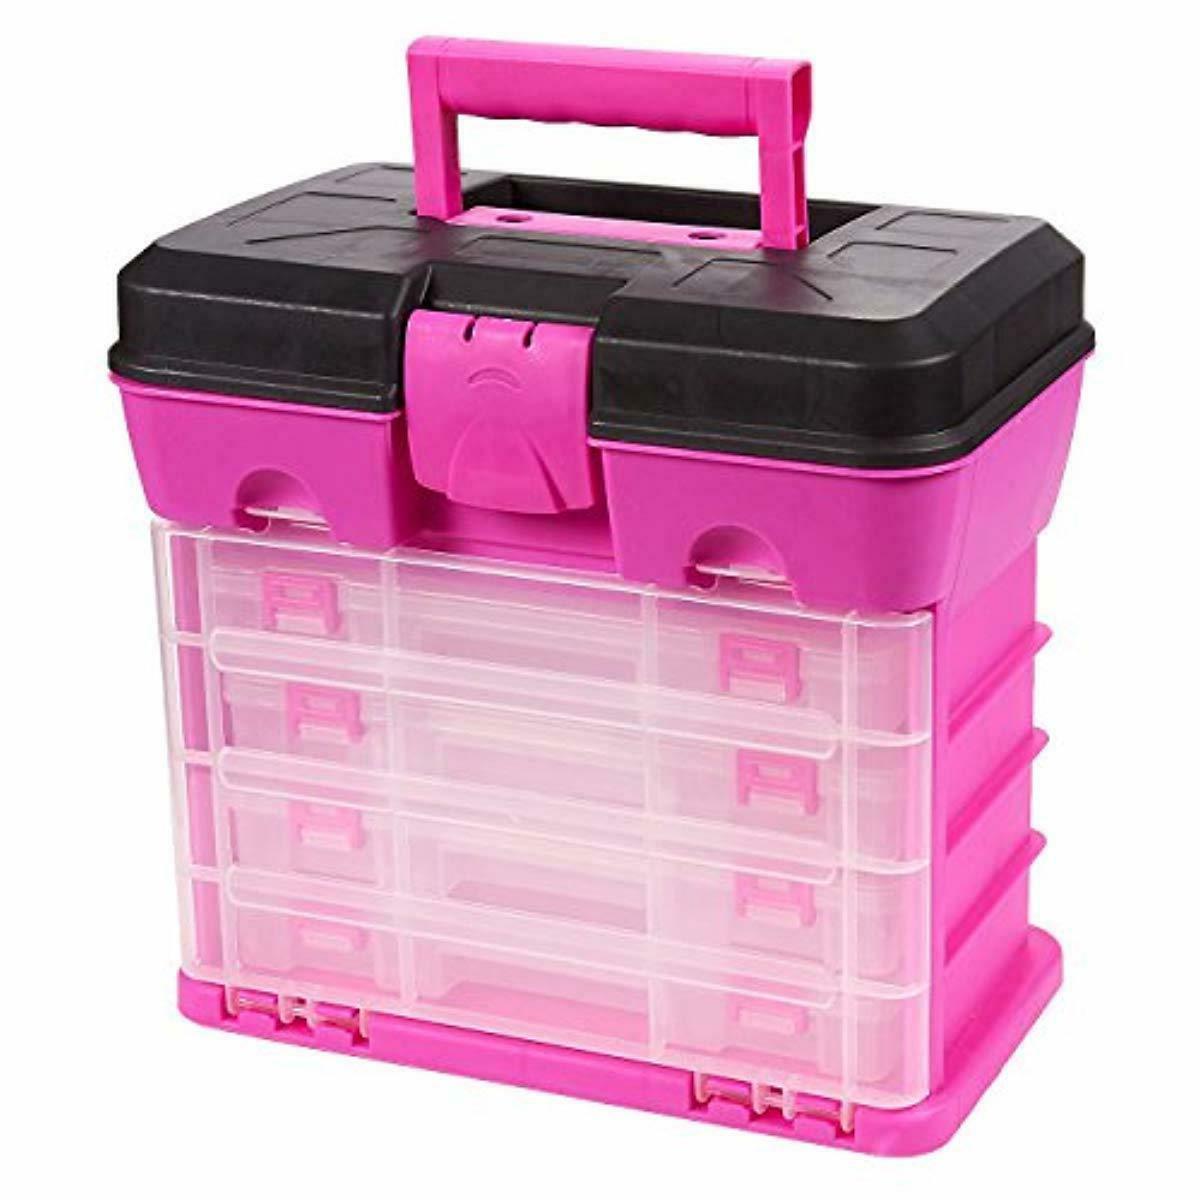 tool box organizer includes 4 13 compartment